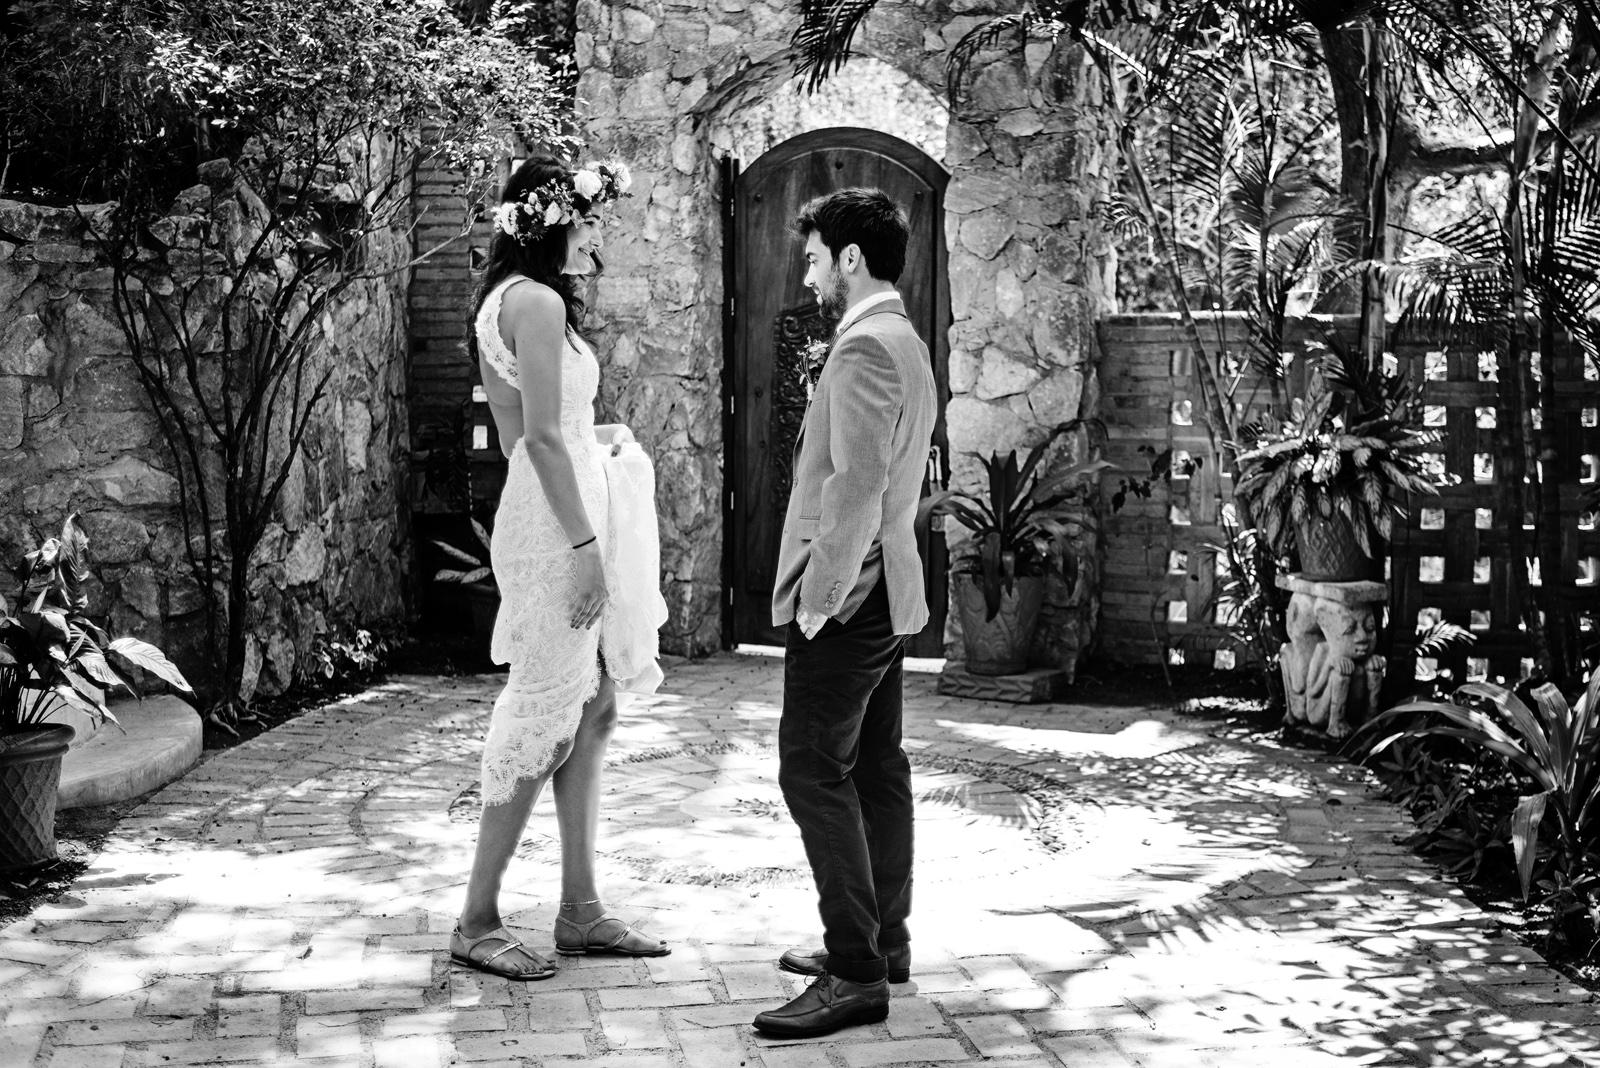 Villa-amor-sayulita-destination-wedding-mexico-008